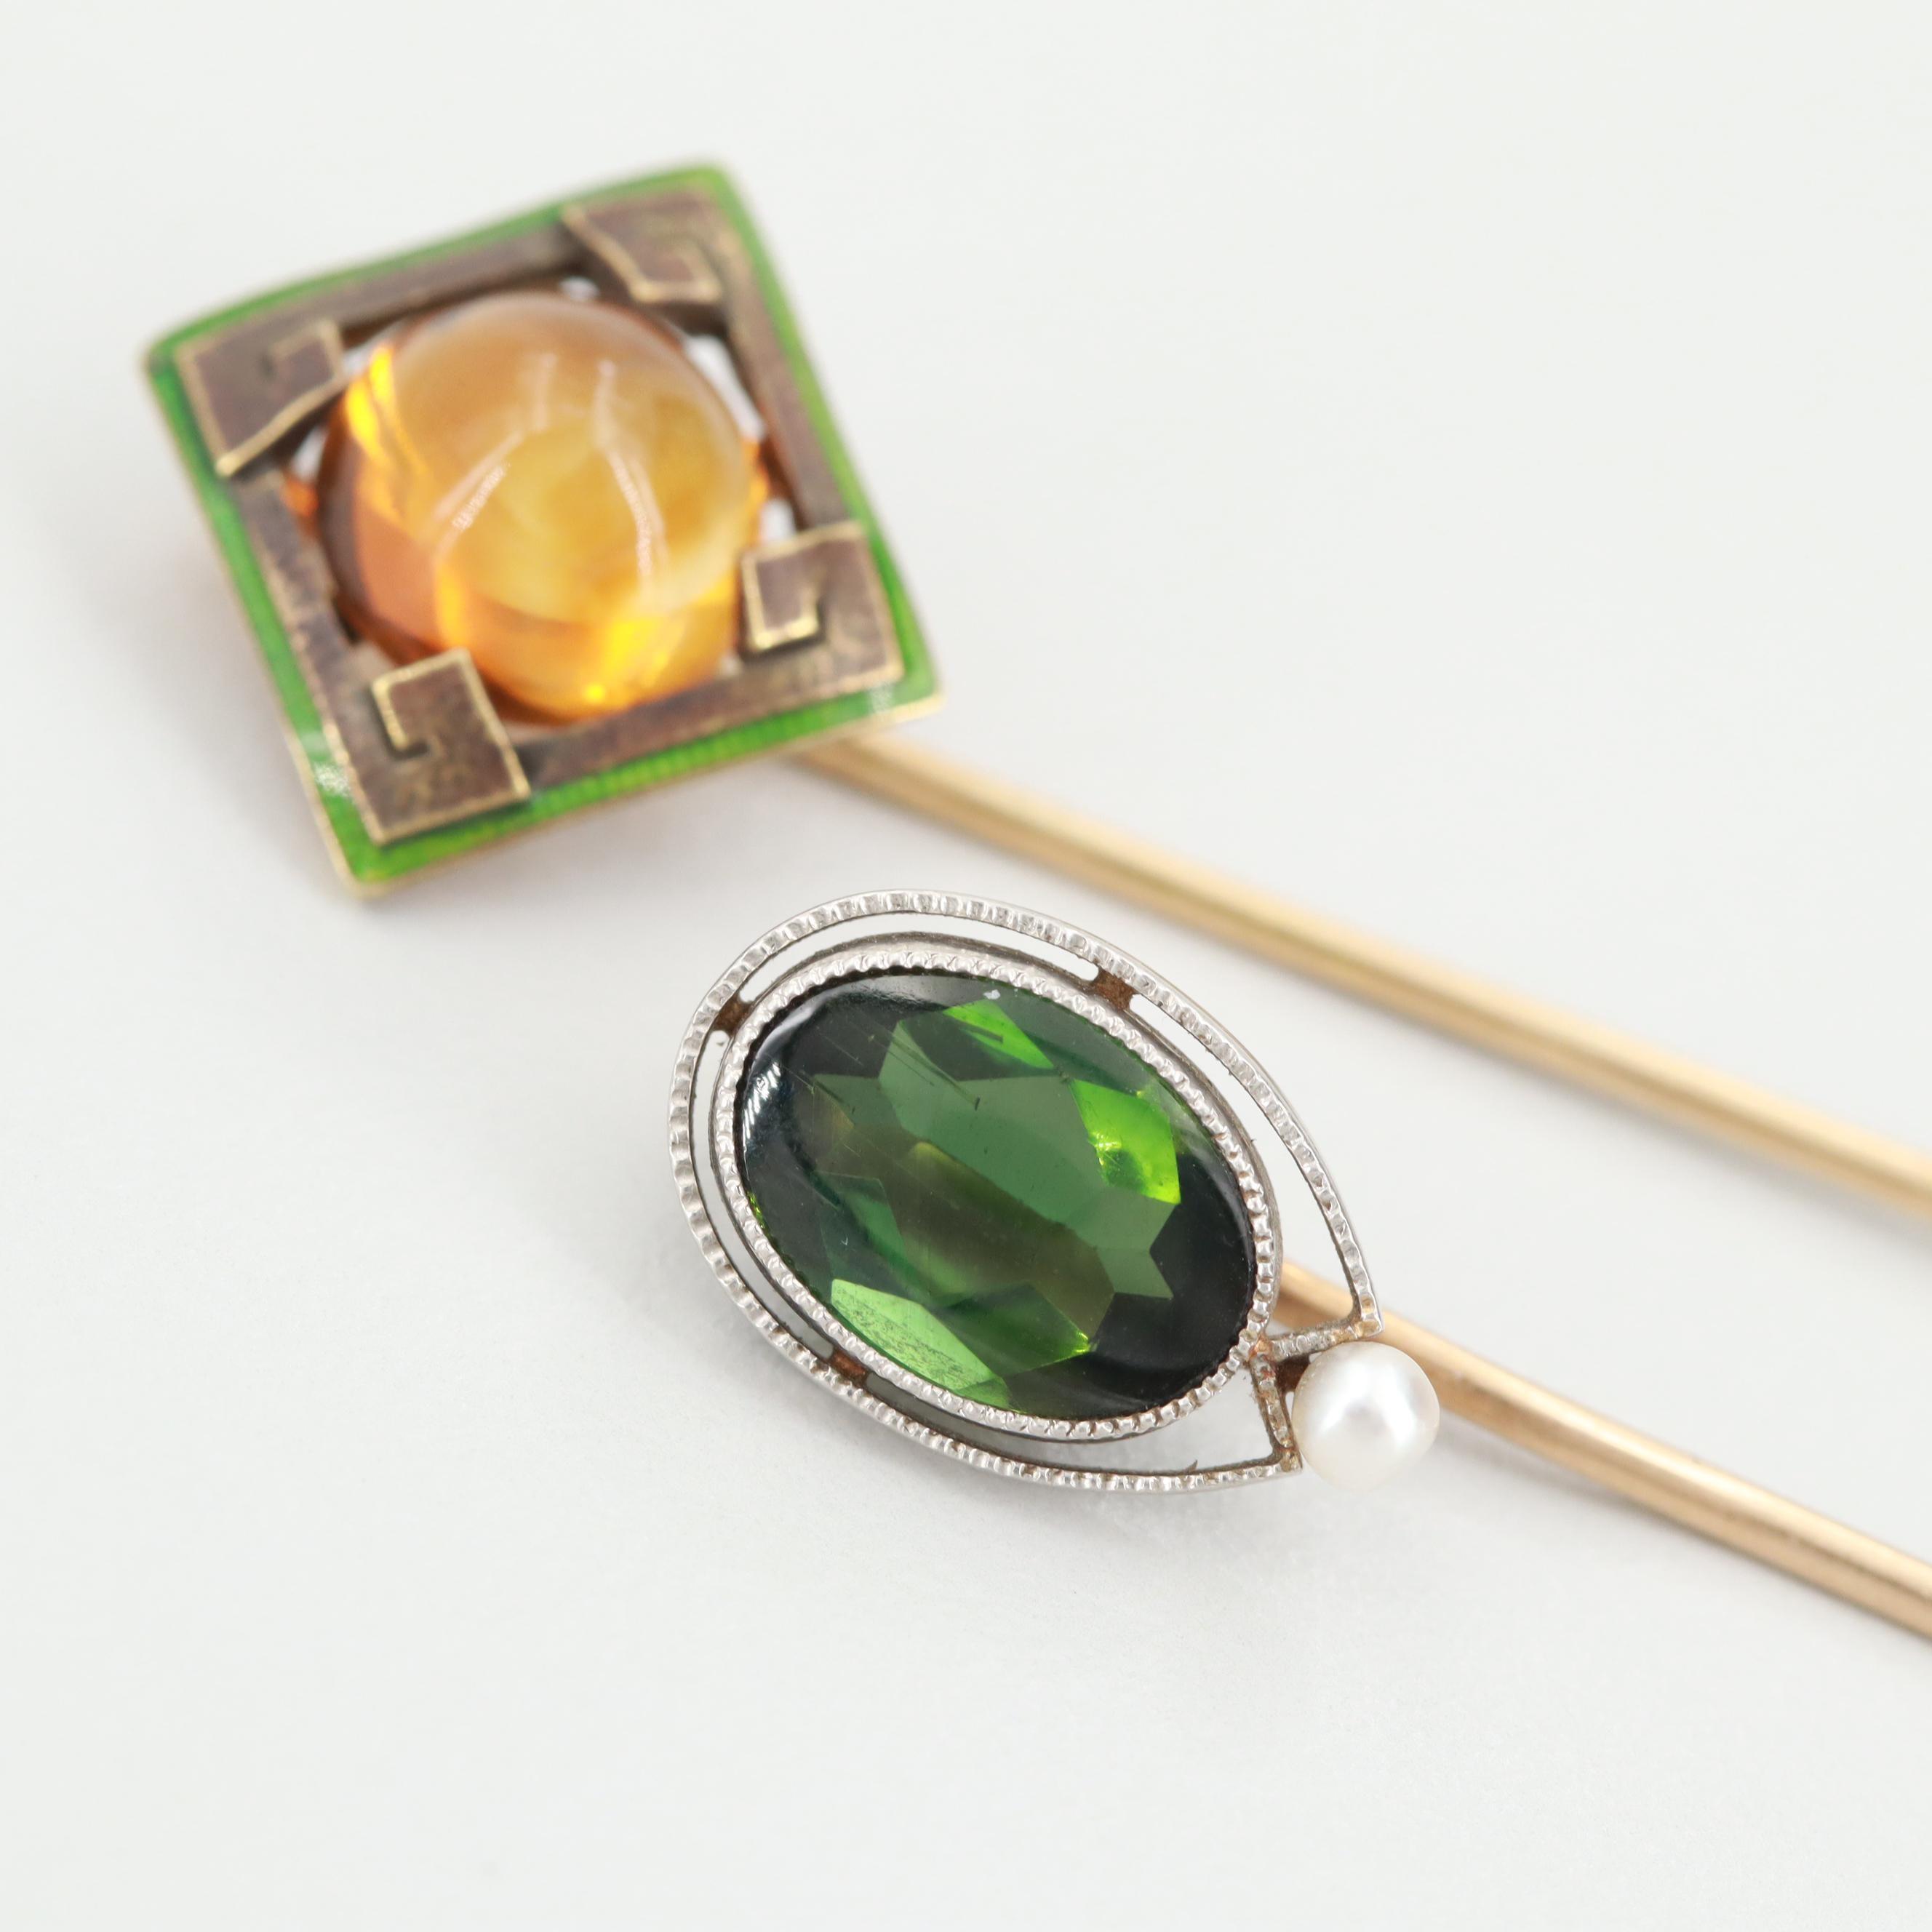 Arts & Crafts 14K Gold and Platinum Green Tourmaline and Gemstone Stick Pins